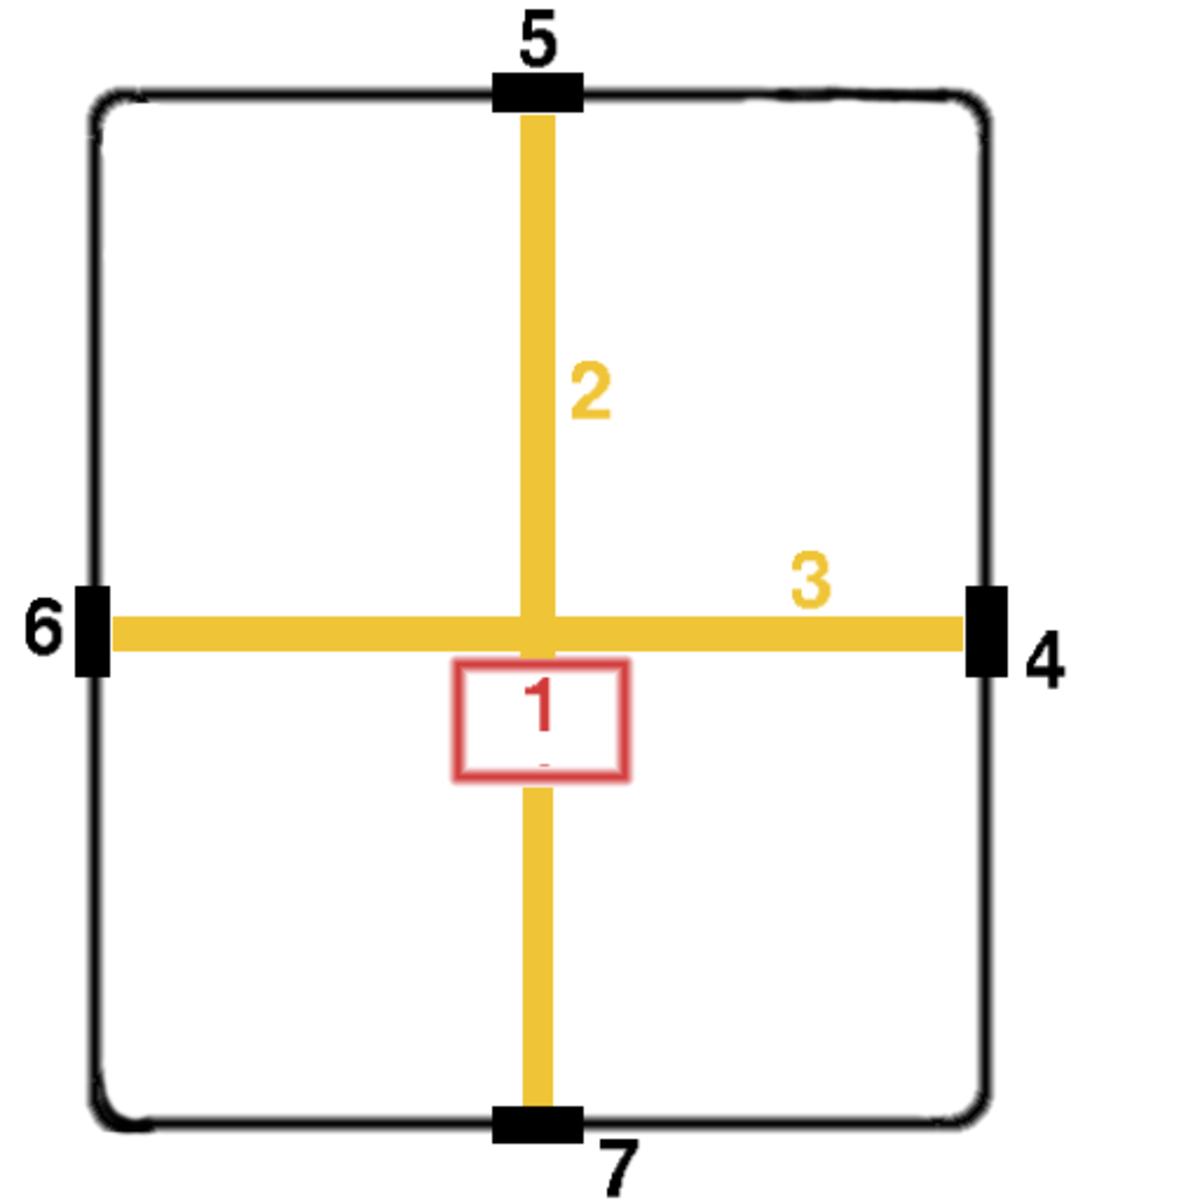 Basic ideal plan of a Roman castrum. (1) Principia; (2) Via Praetoria; (3) Via Principalis; (4) Porta Principalis Dextra; (5) Porta Praetoria (main gate); (6) Porta Principalis Sinistra; (7) Porta Decumana (back gate).